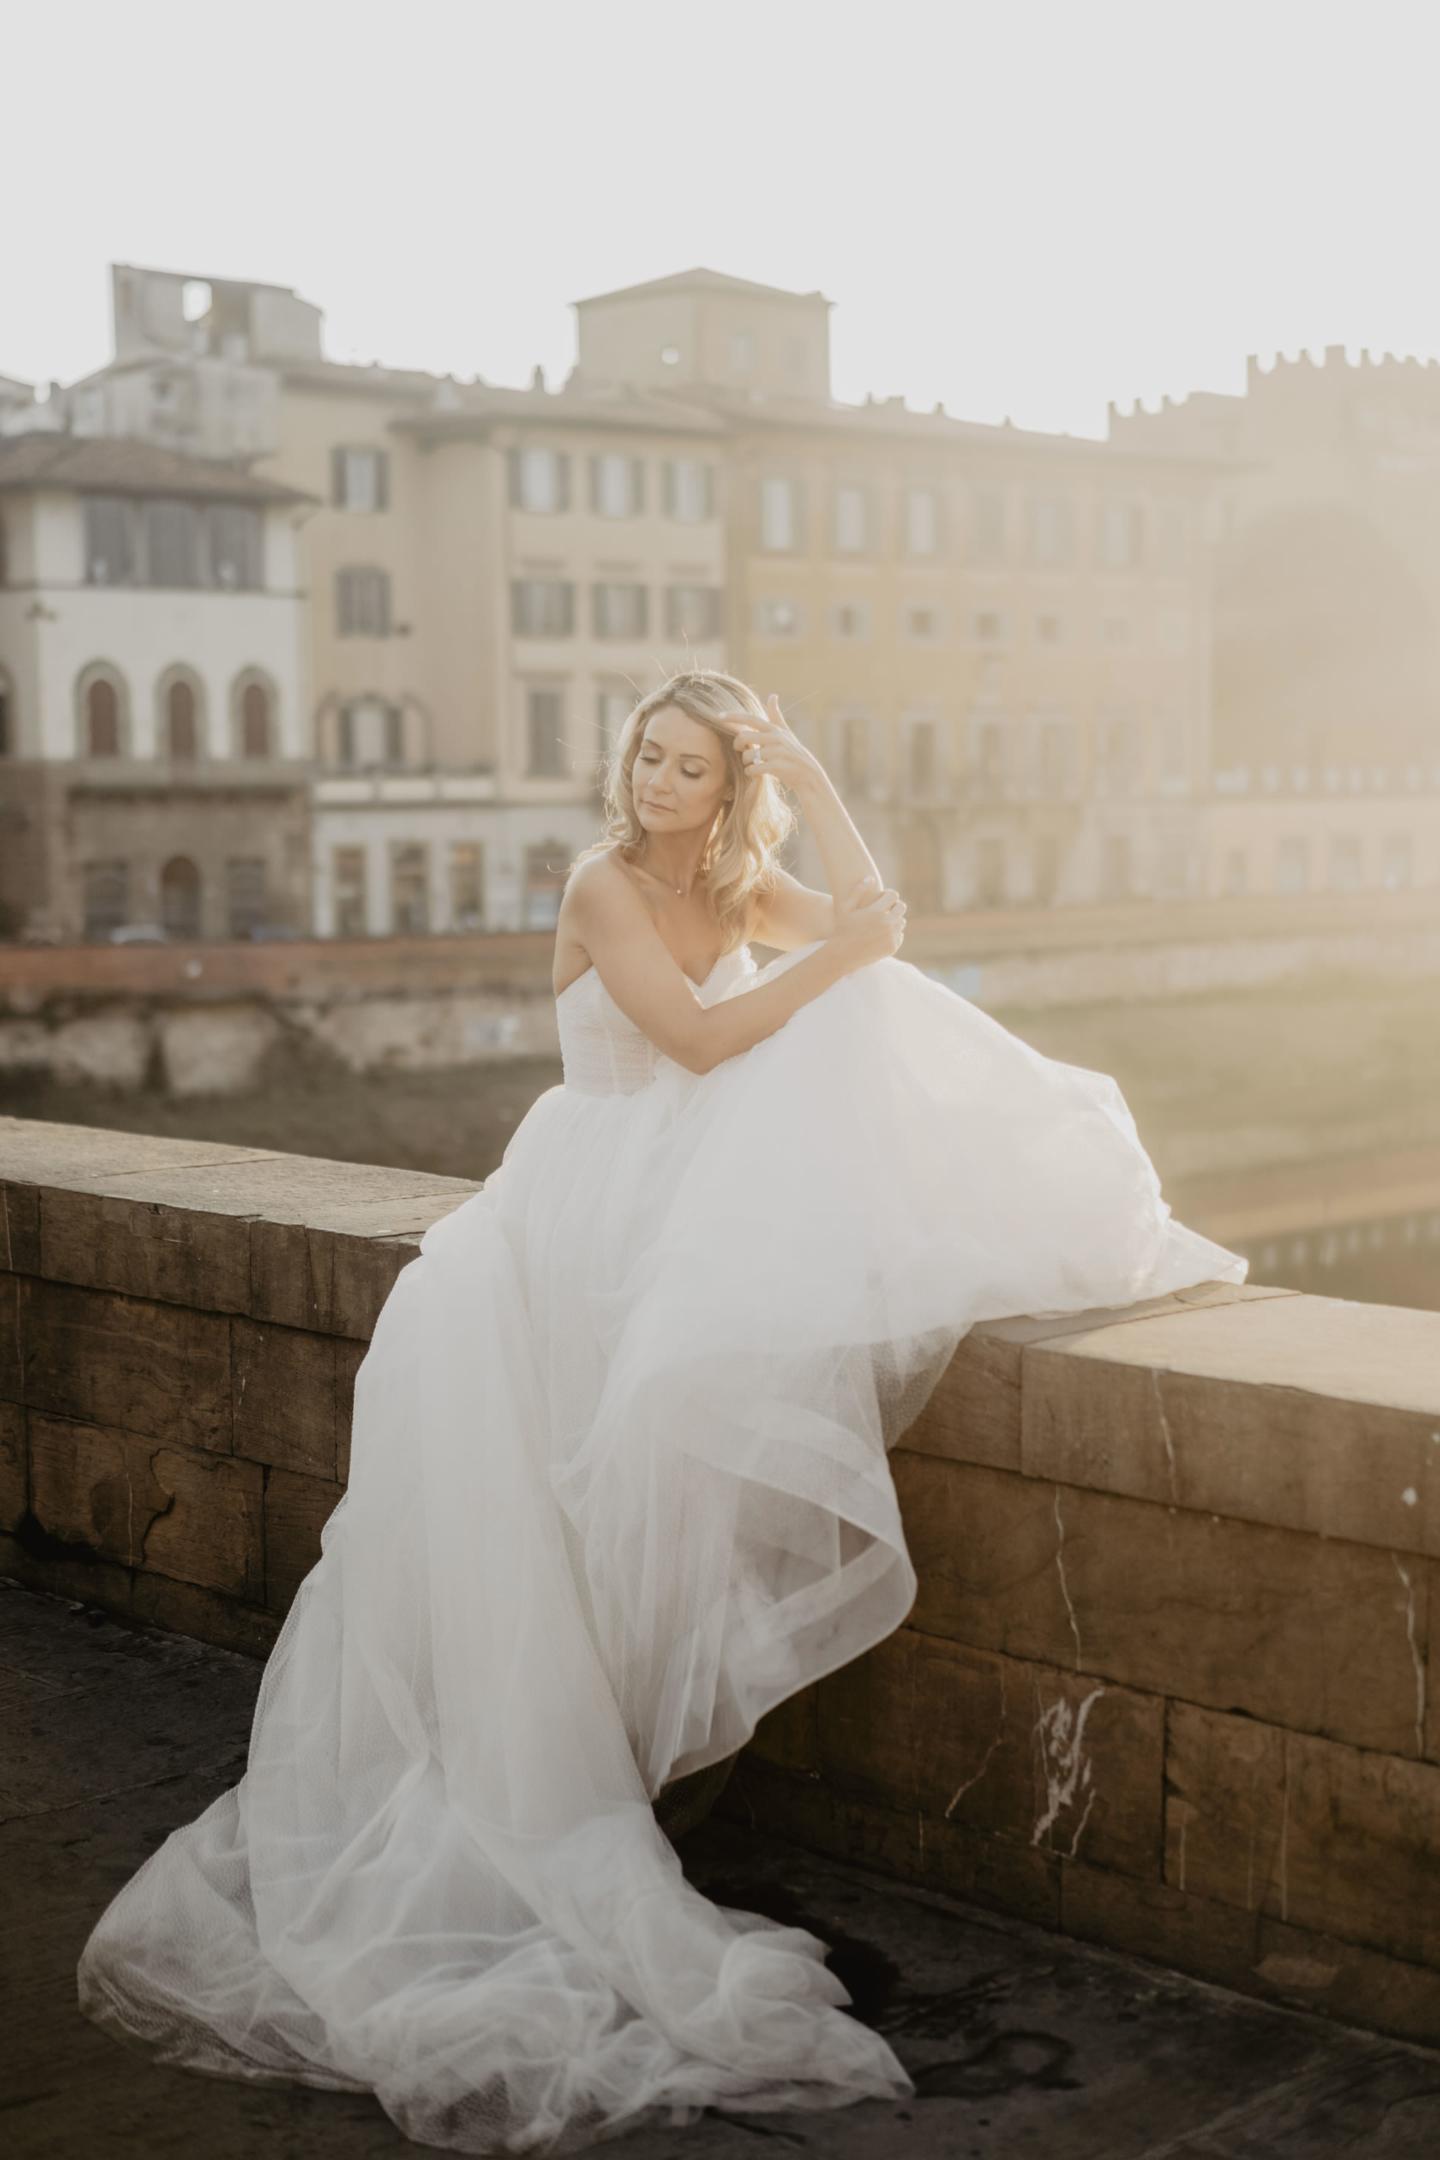 A sparkling wedding in the shore of the Arno - 55 :: A sparkling wedding on the shore of the Arno :: Luxury wedding photography - 54 :: A sparkling wedding in the shore of the Arno - 55